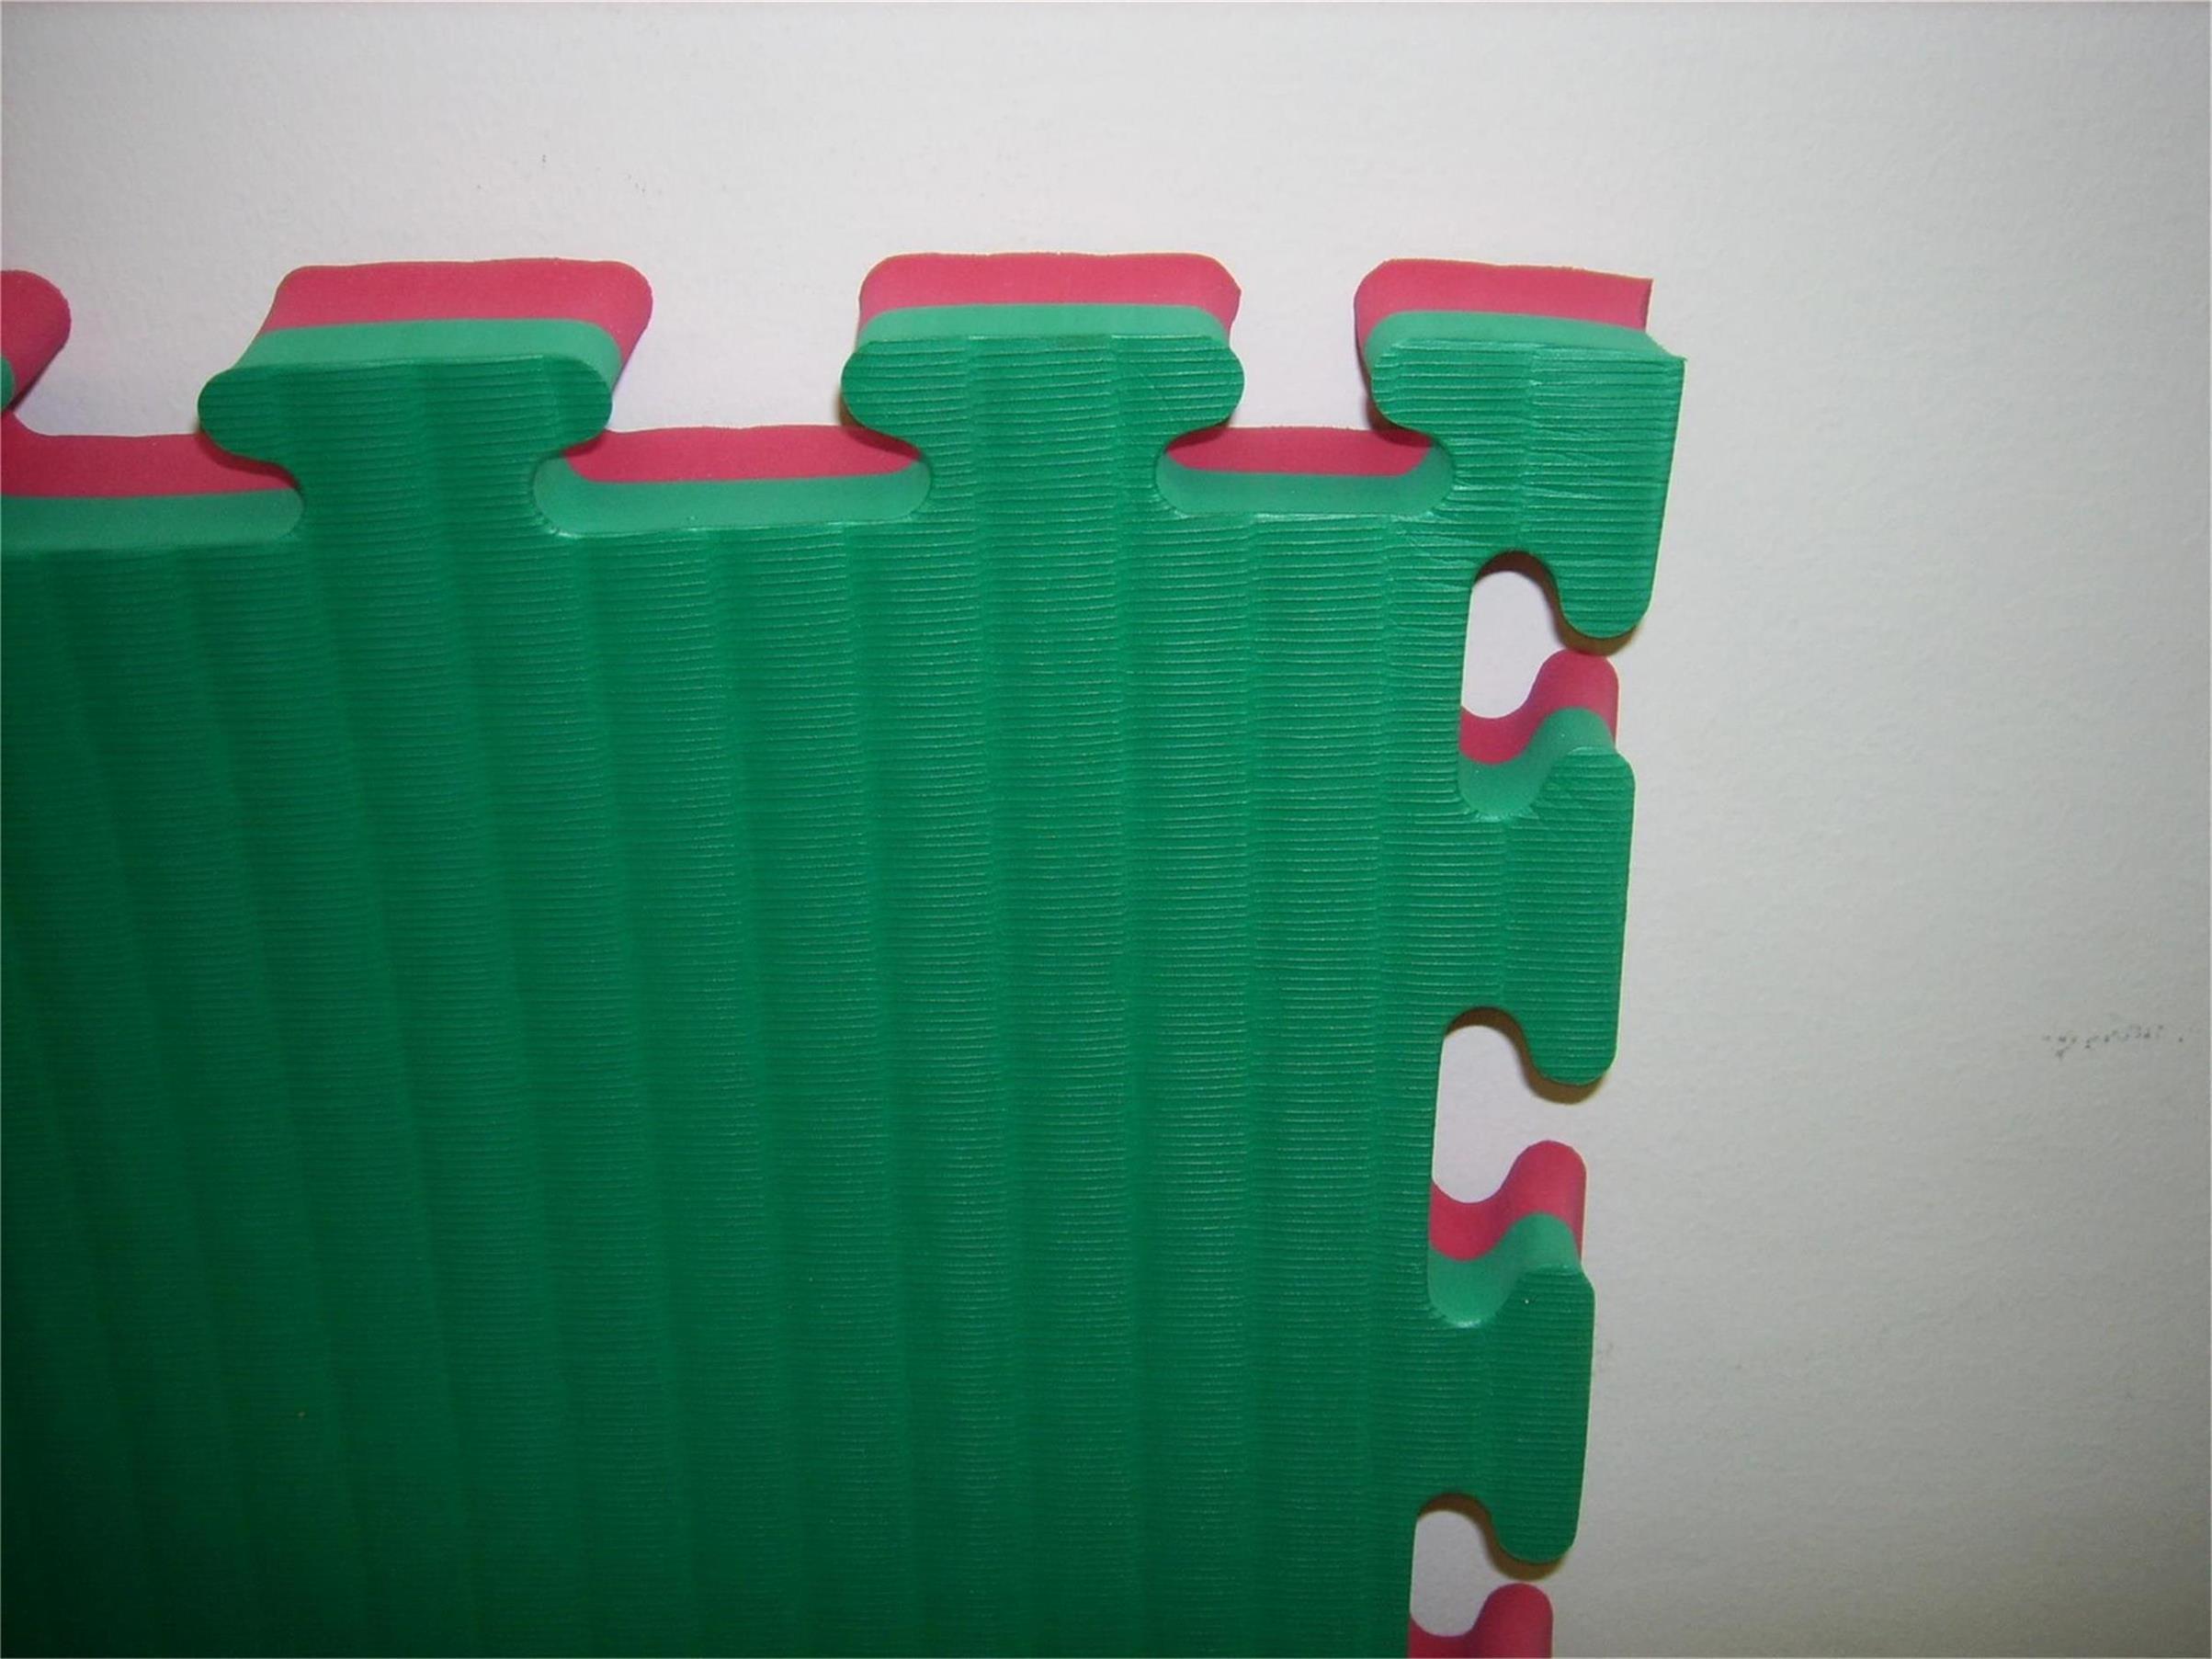 EVA Karate Sports Mat with Interlock Style